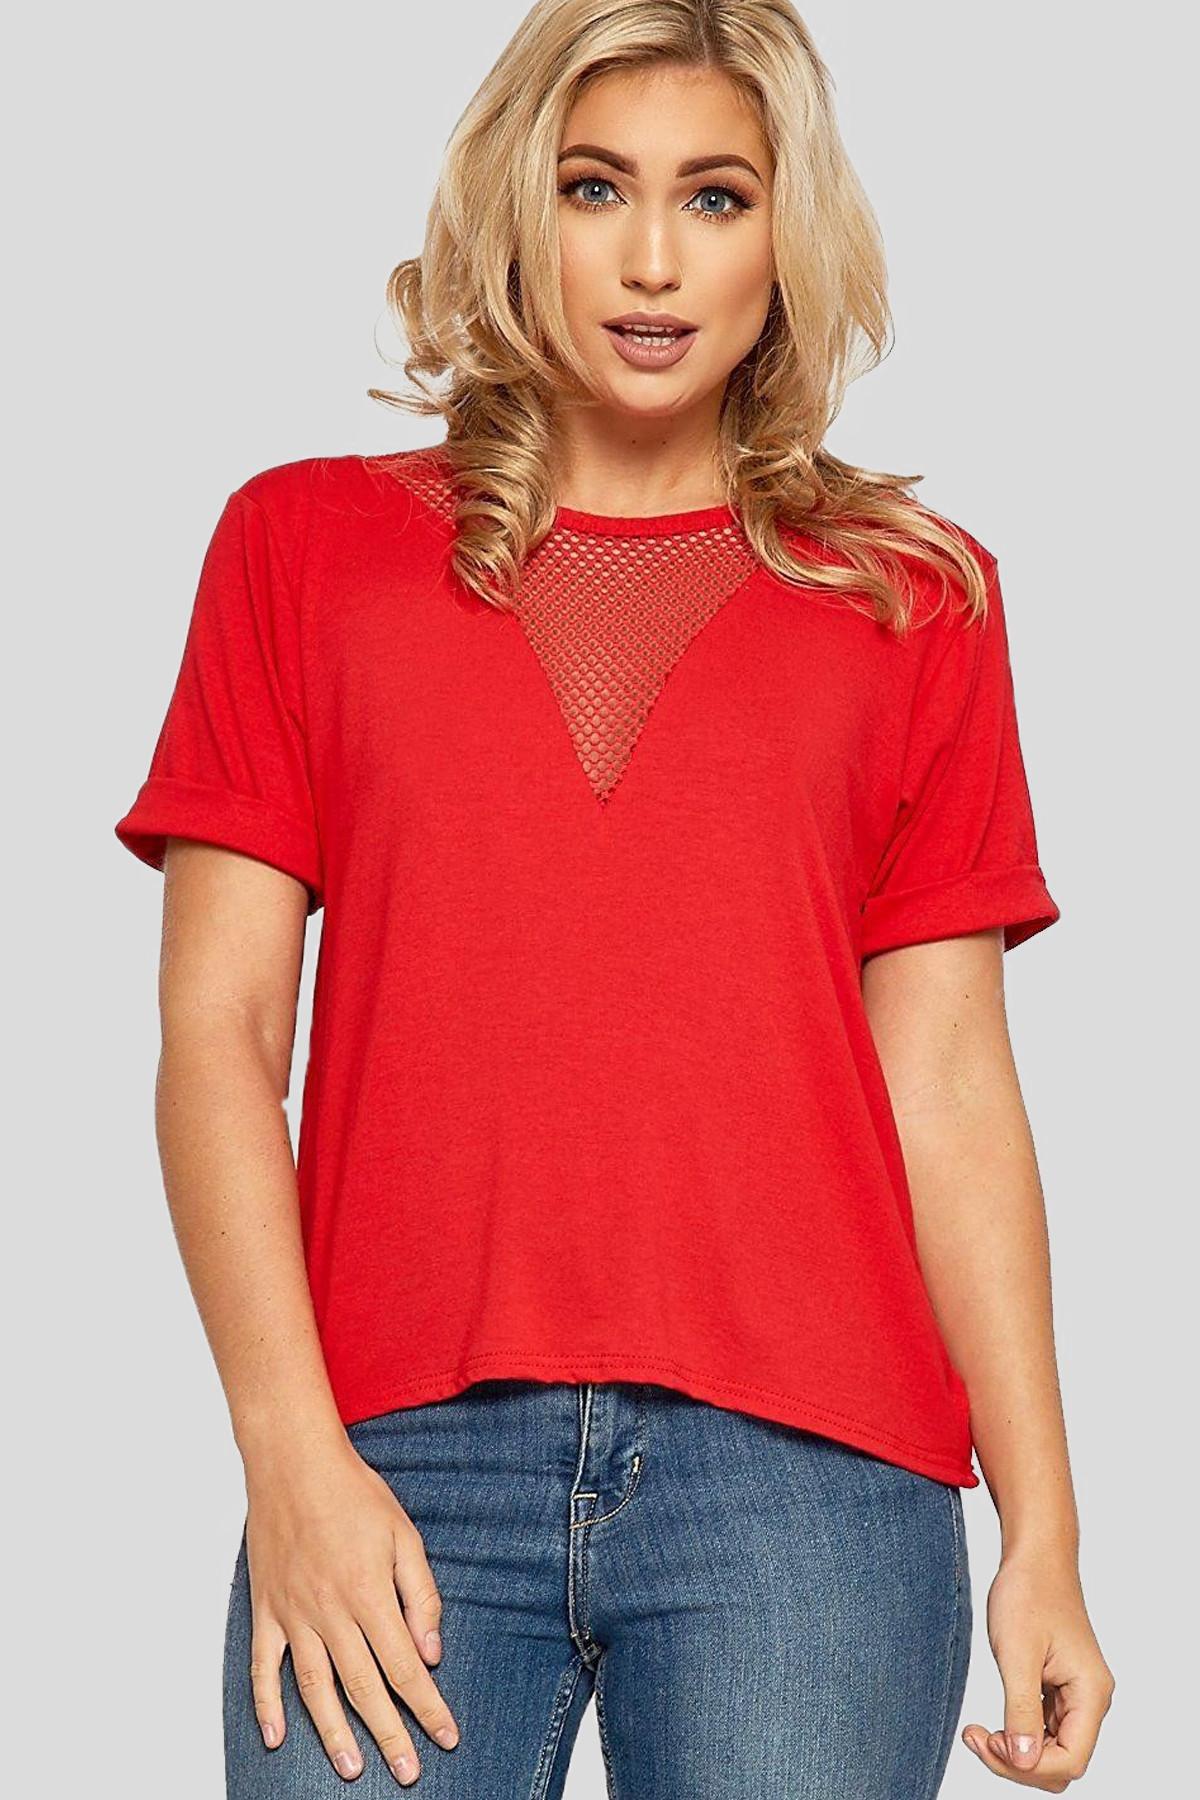 a4875737 Zara Plain Fishnet T-Shirt Tops 8-14 - Tops - Clothing